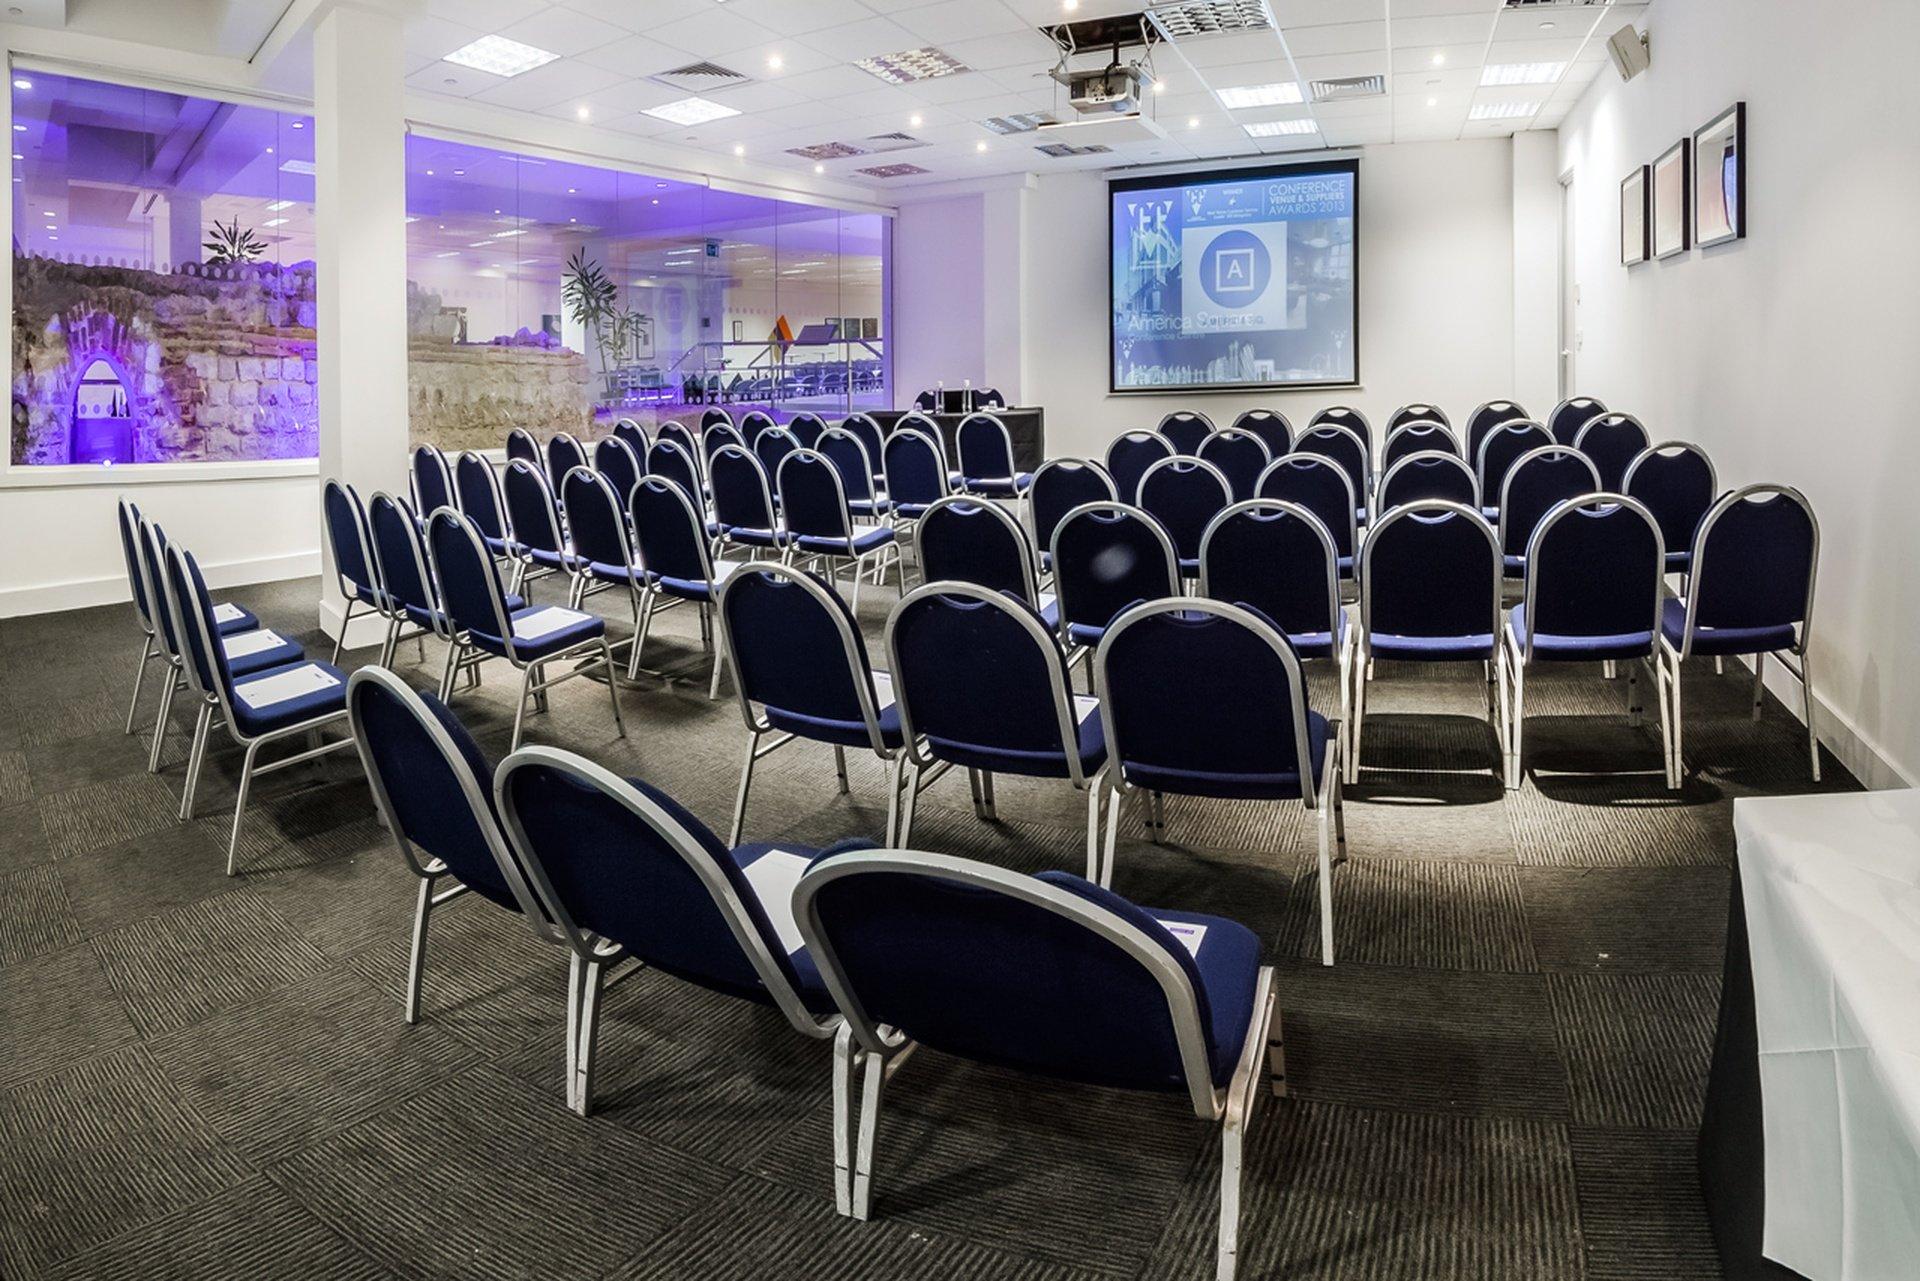 London workshop spaces Meetingraum America Square - Walbrook Suite image 0